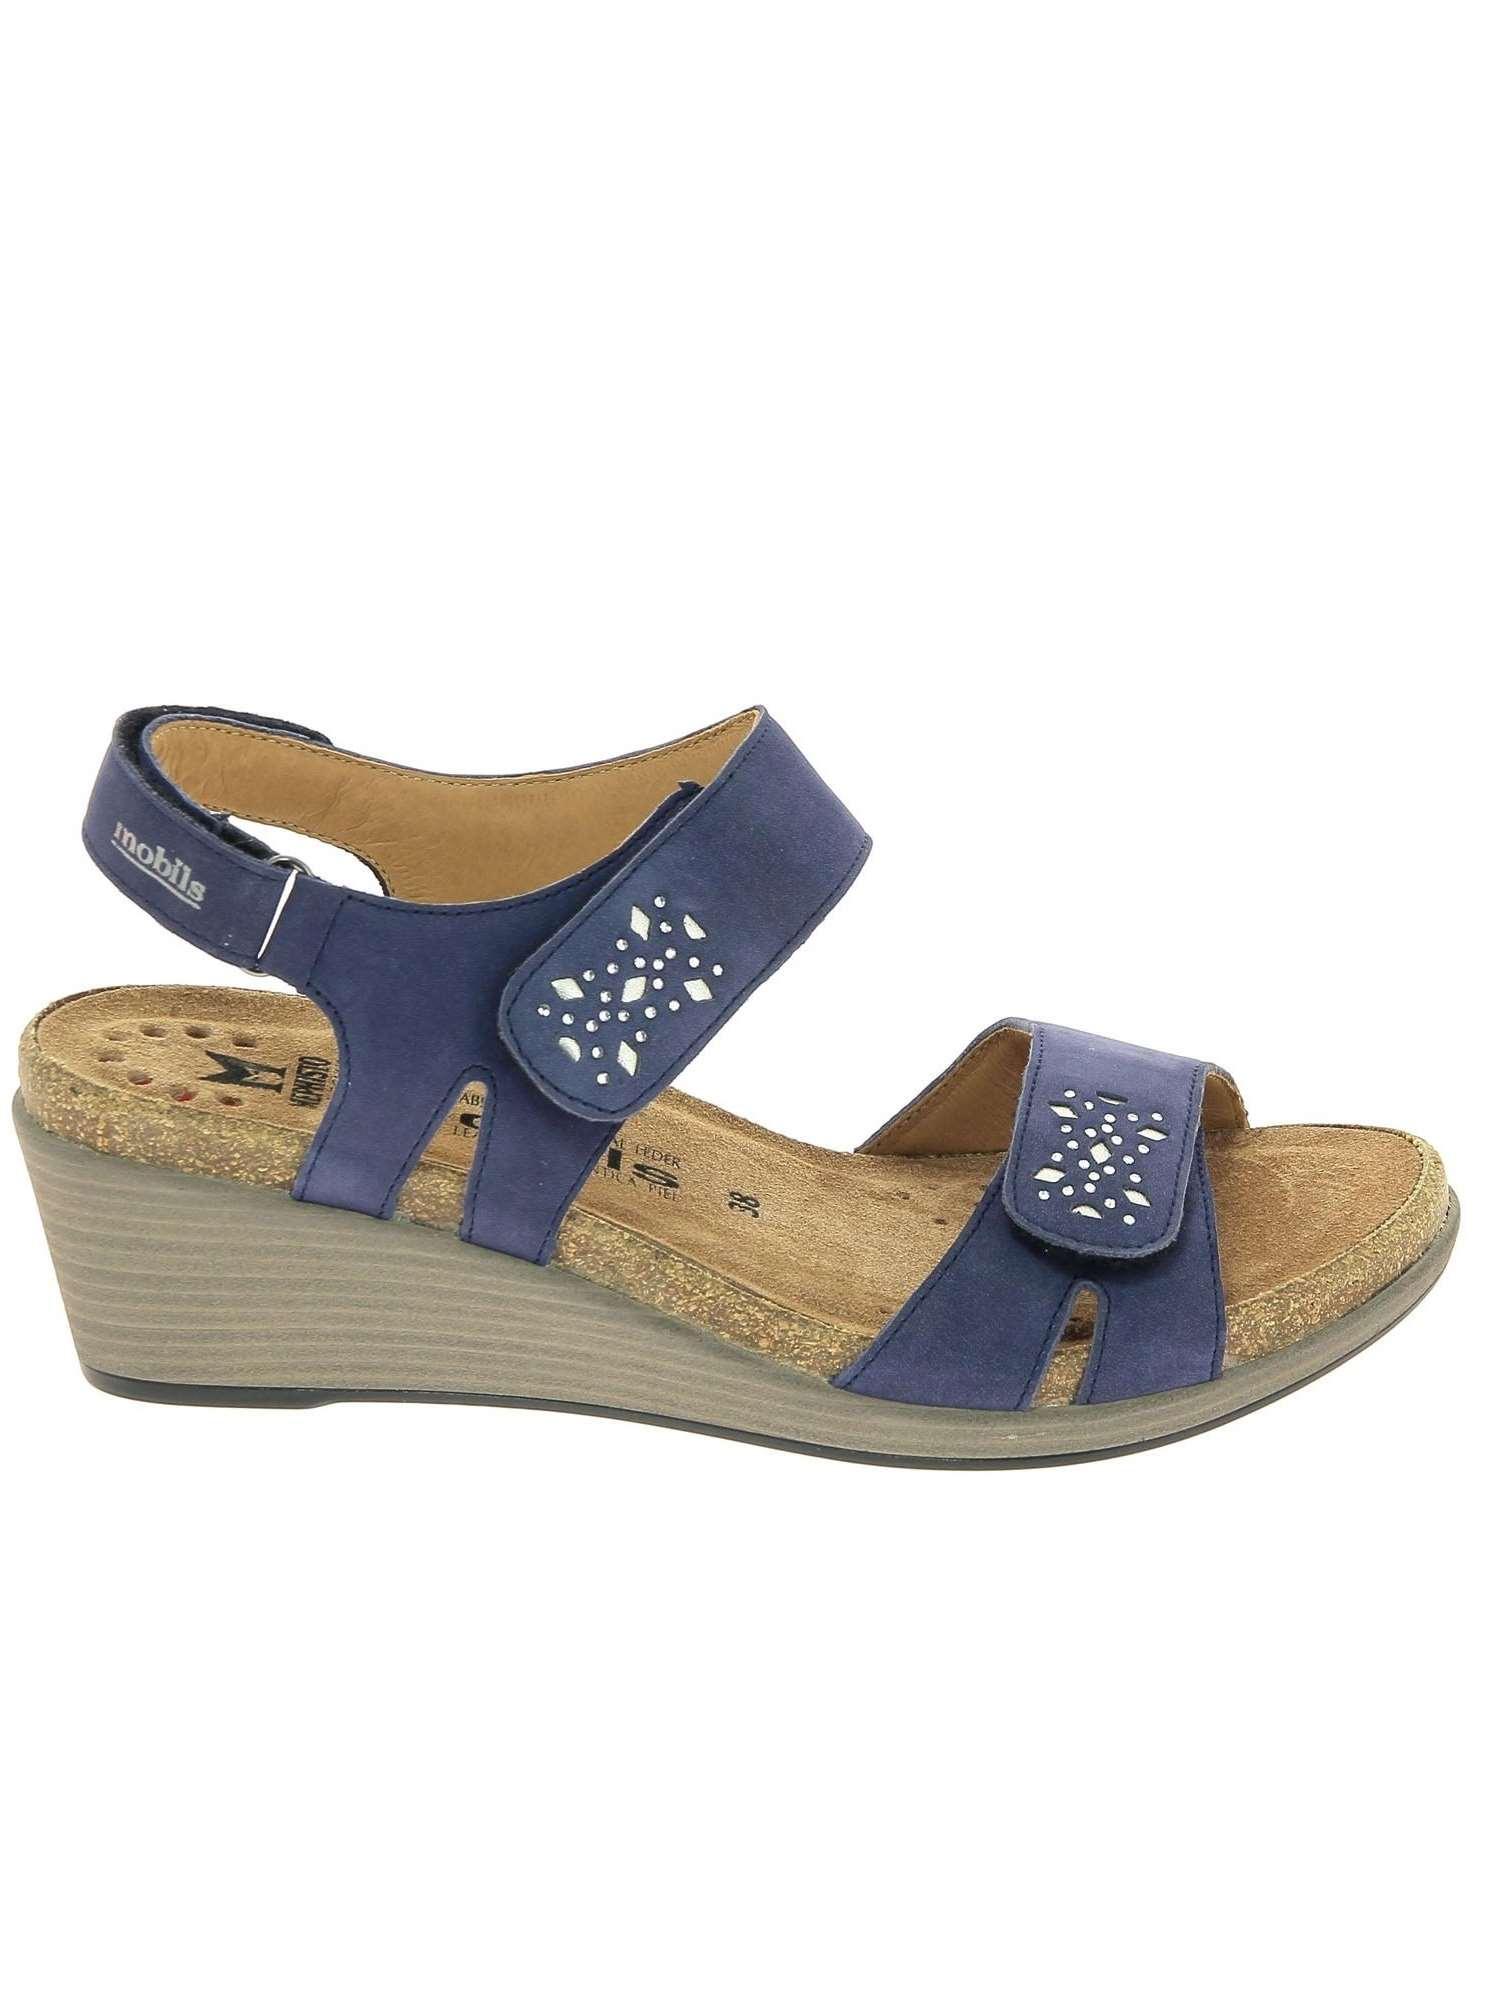 online store db487 1ee0d Mephisto Donna Sandalo Jeans | Sandalo Donna Nubuk | Tania ...